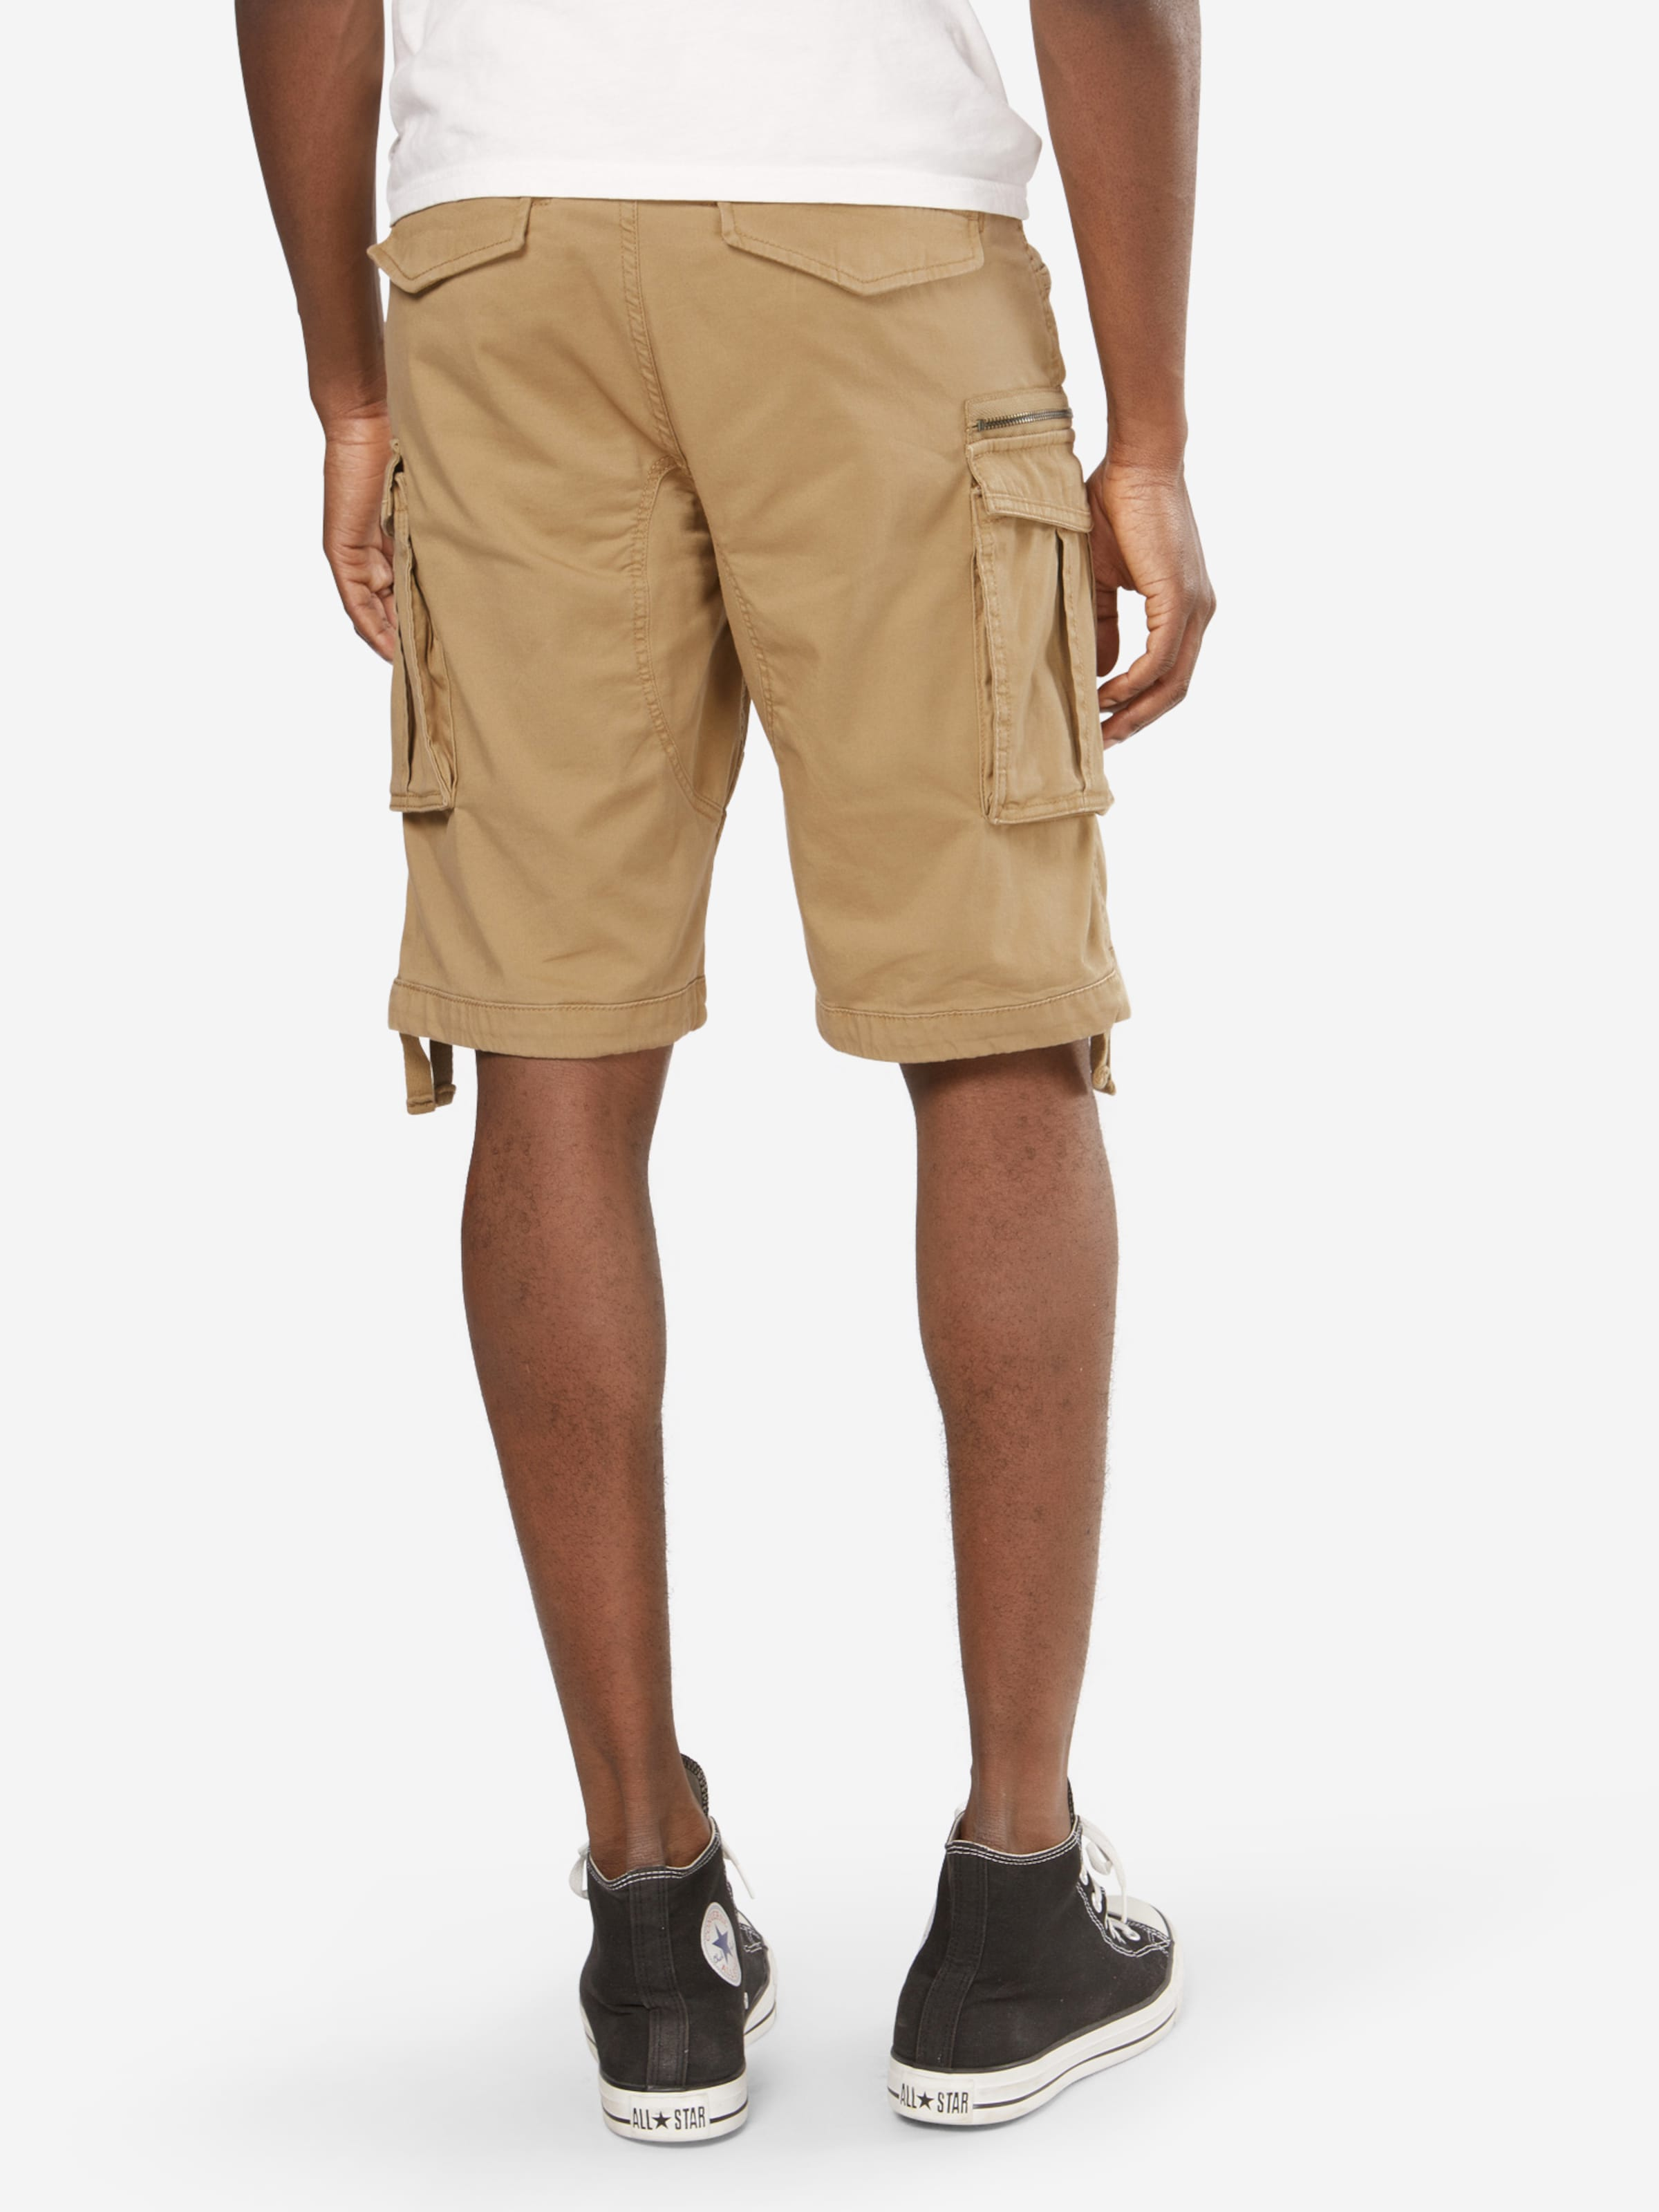 Jackamp; Shorts Jones Jackamp; Hellbeige Shorts Hellbeige In Jackamp; In Jones LUqjSzMVpG